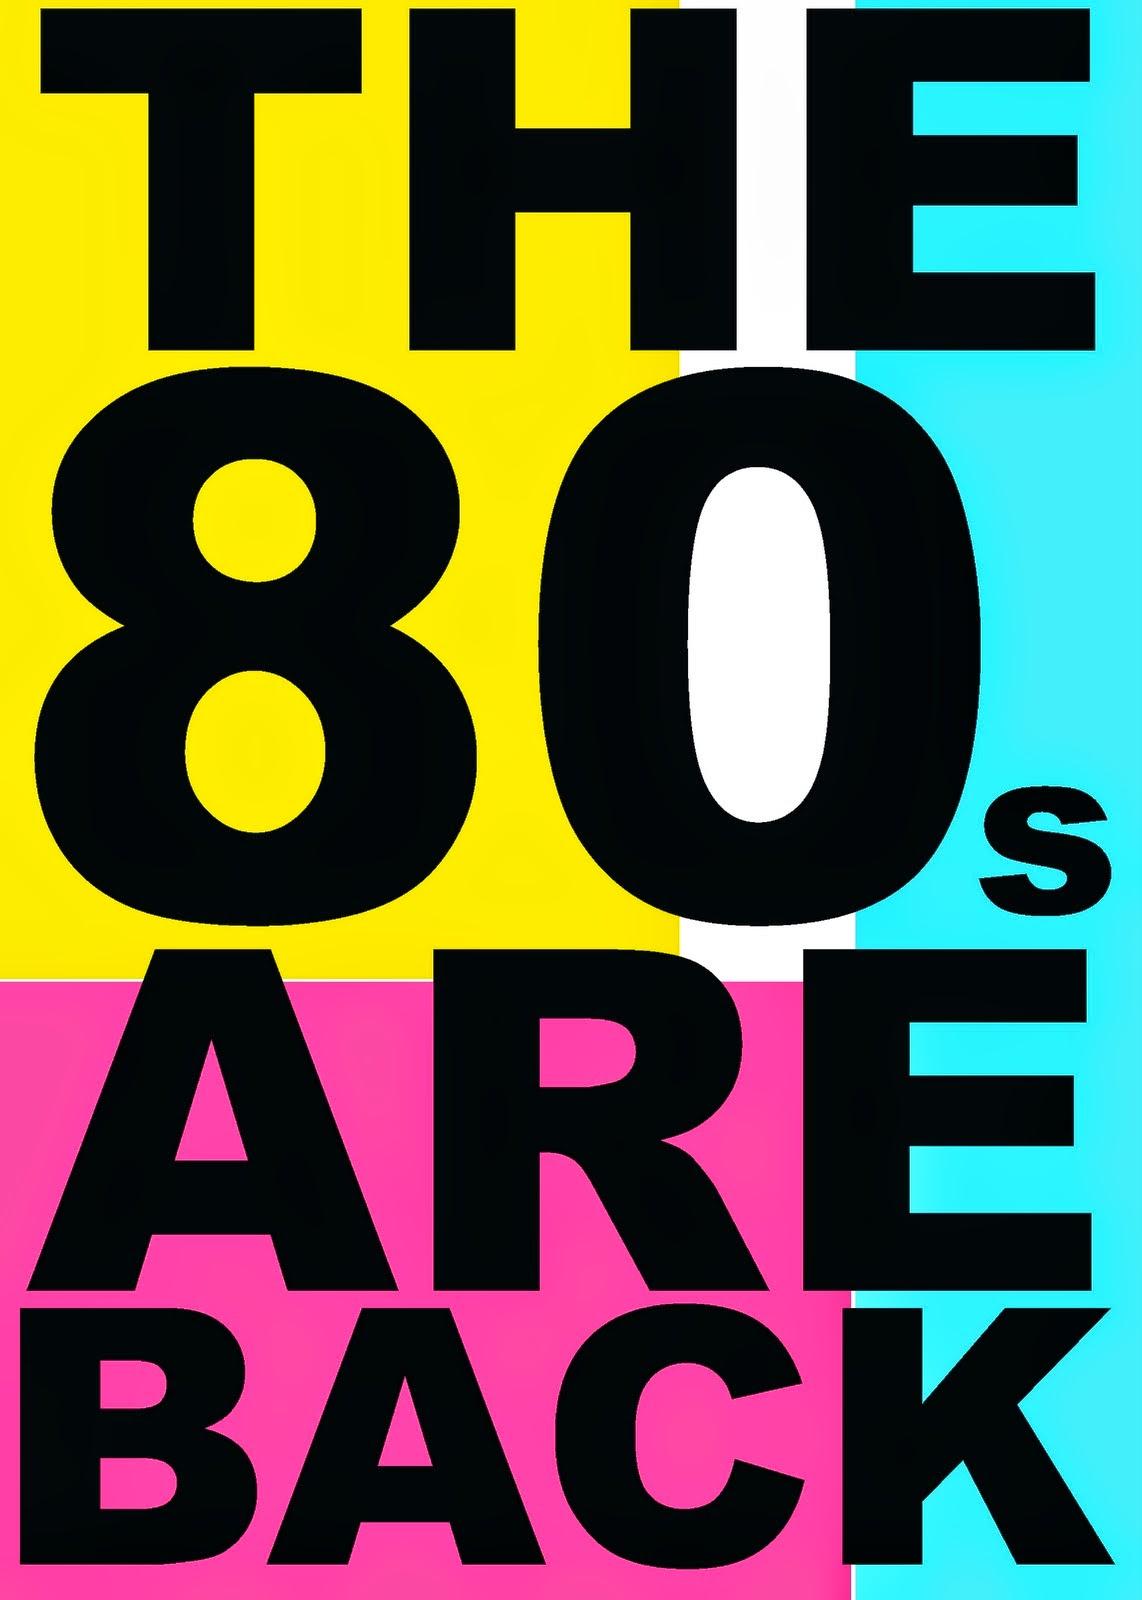 Mp3 Barat Dance Rock Pop Tahun 80 an Yang Banyak Kenangan